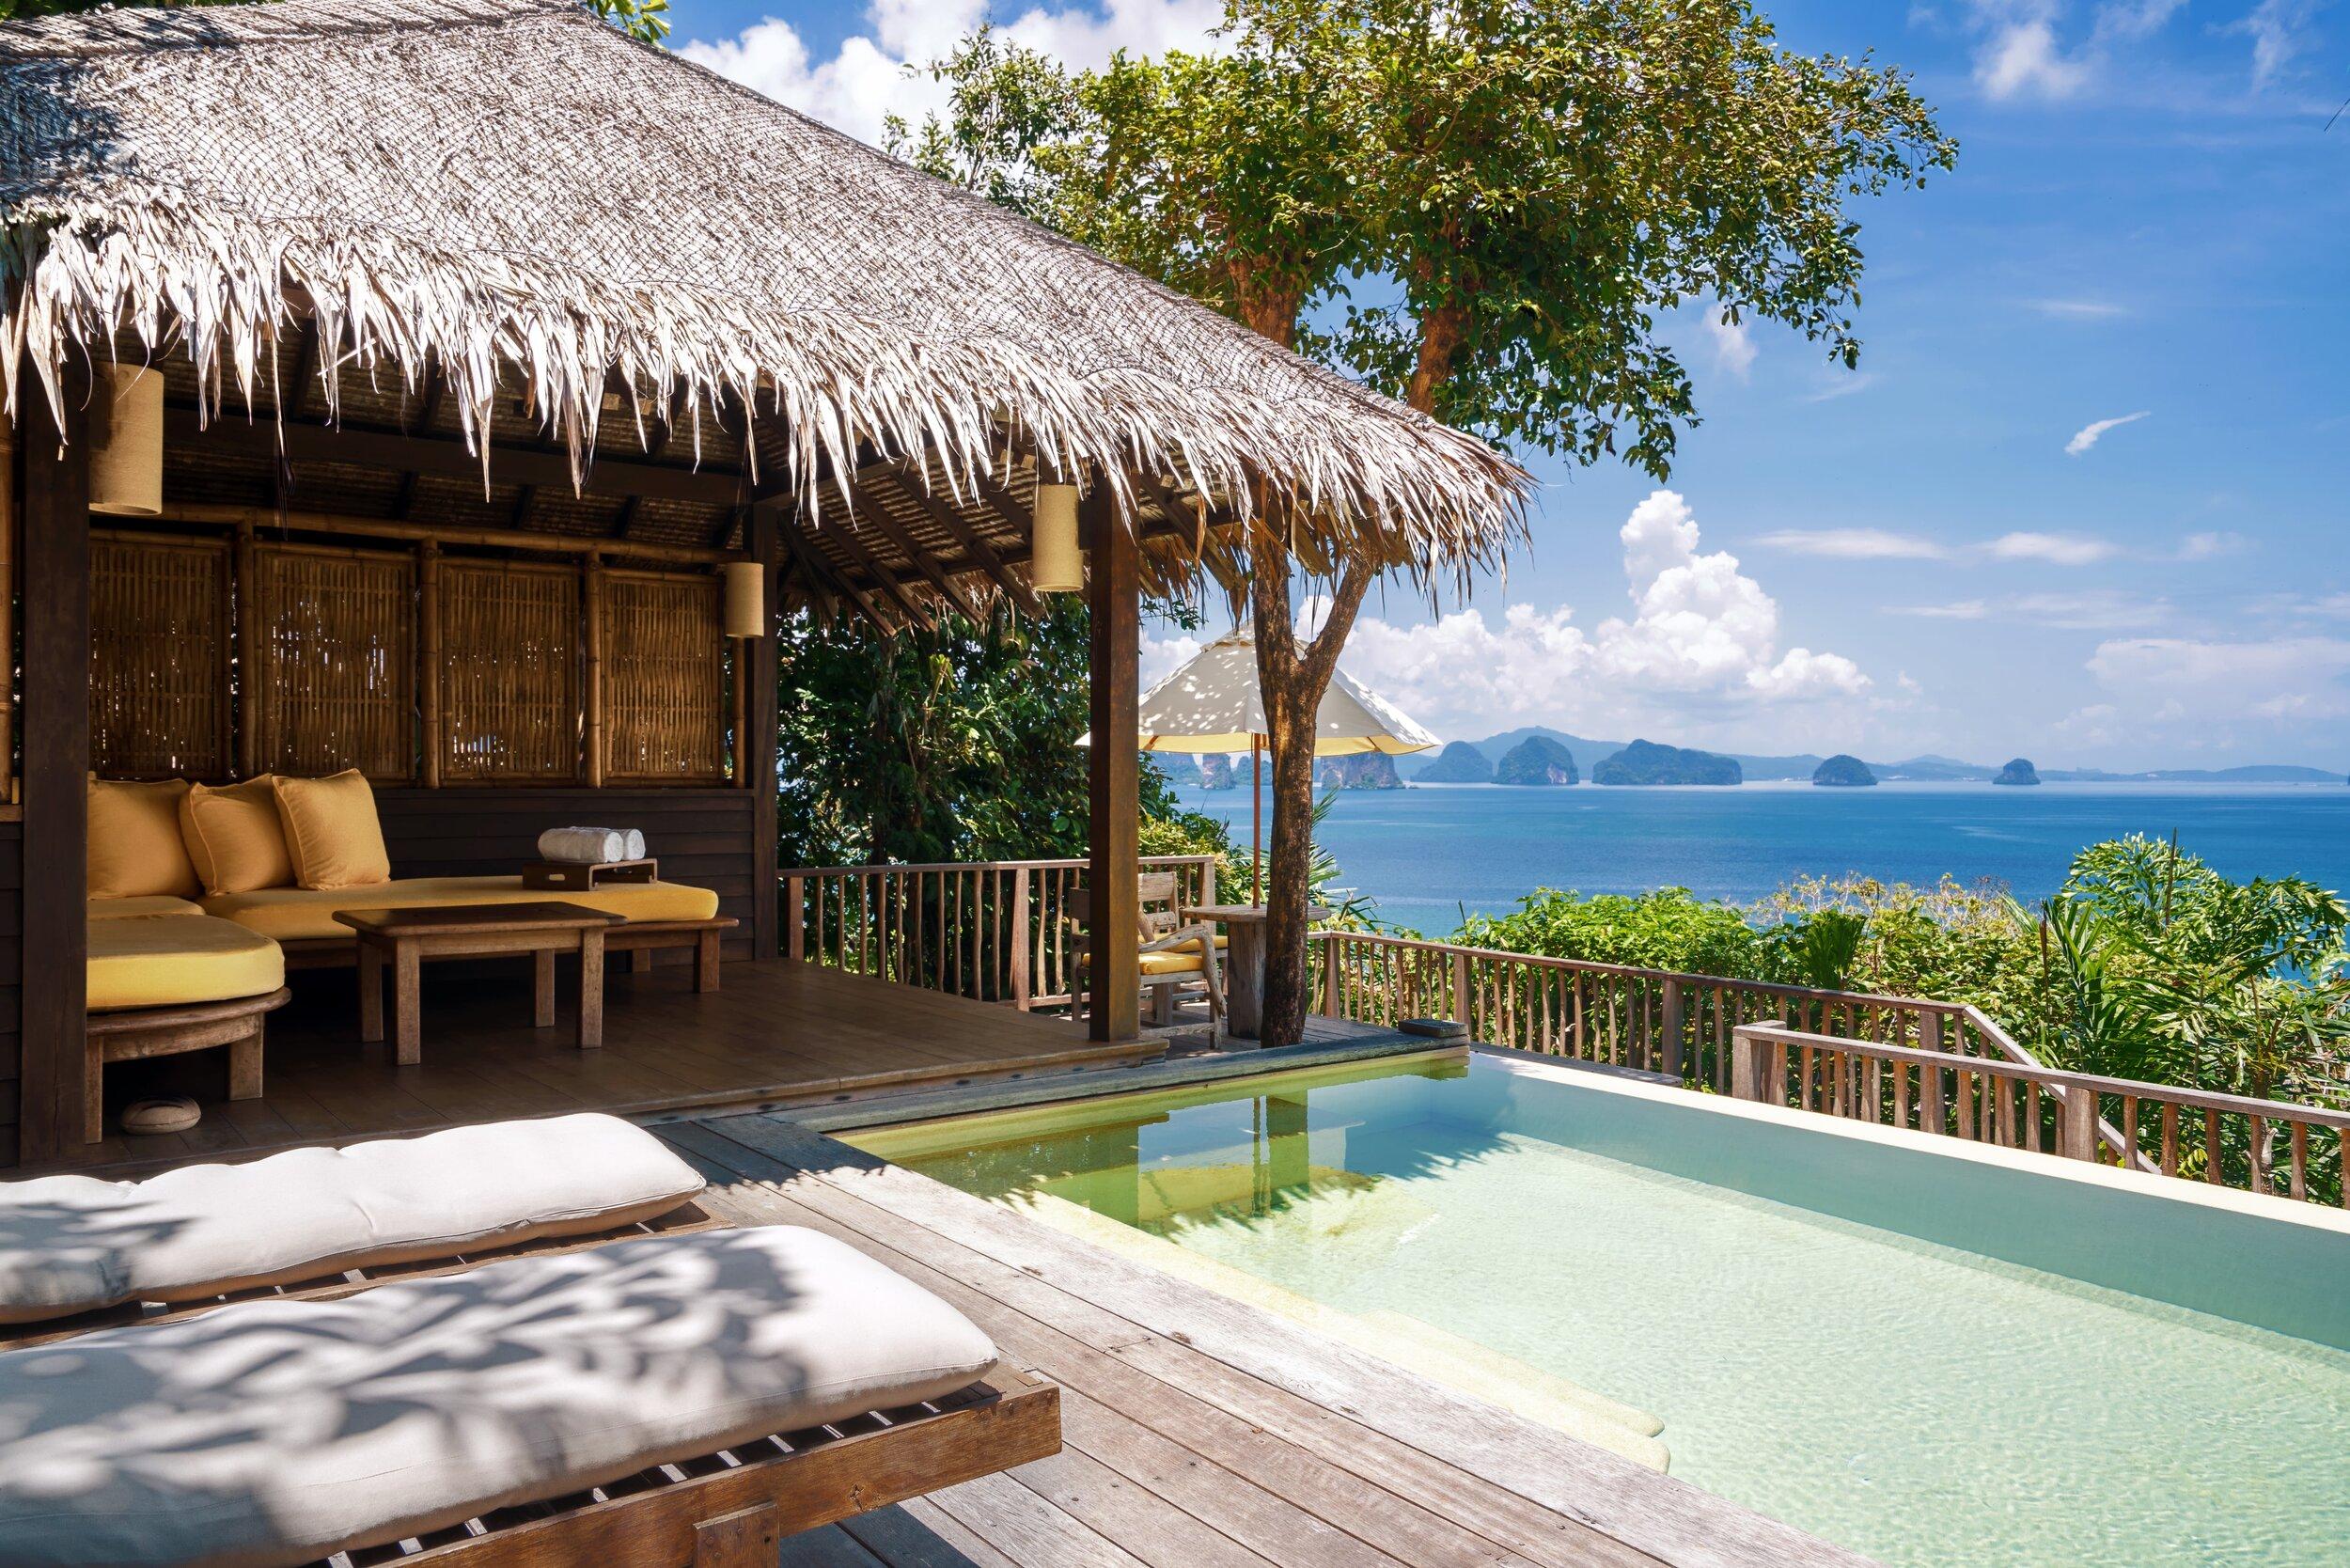 Ocean Pool Villa, Six Senses Yao Noi